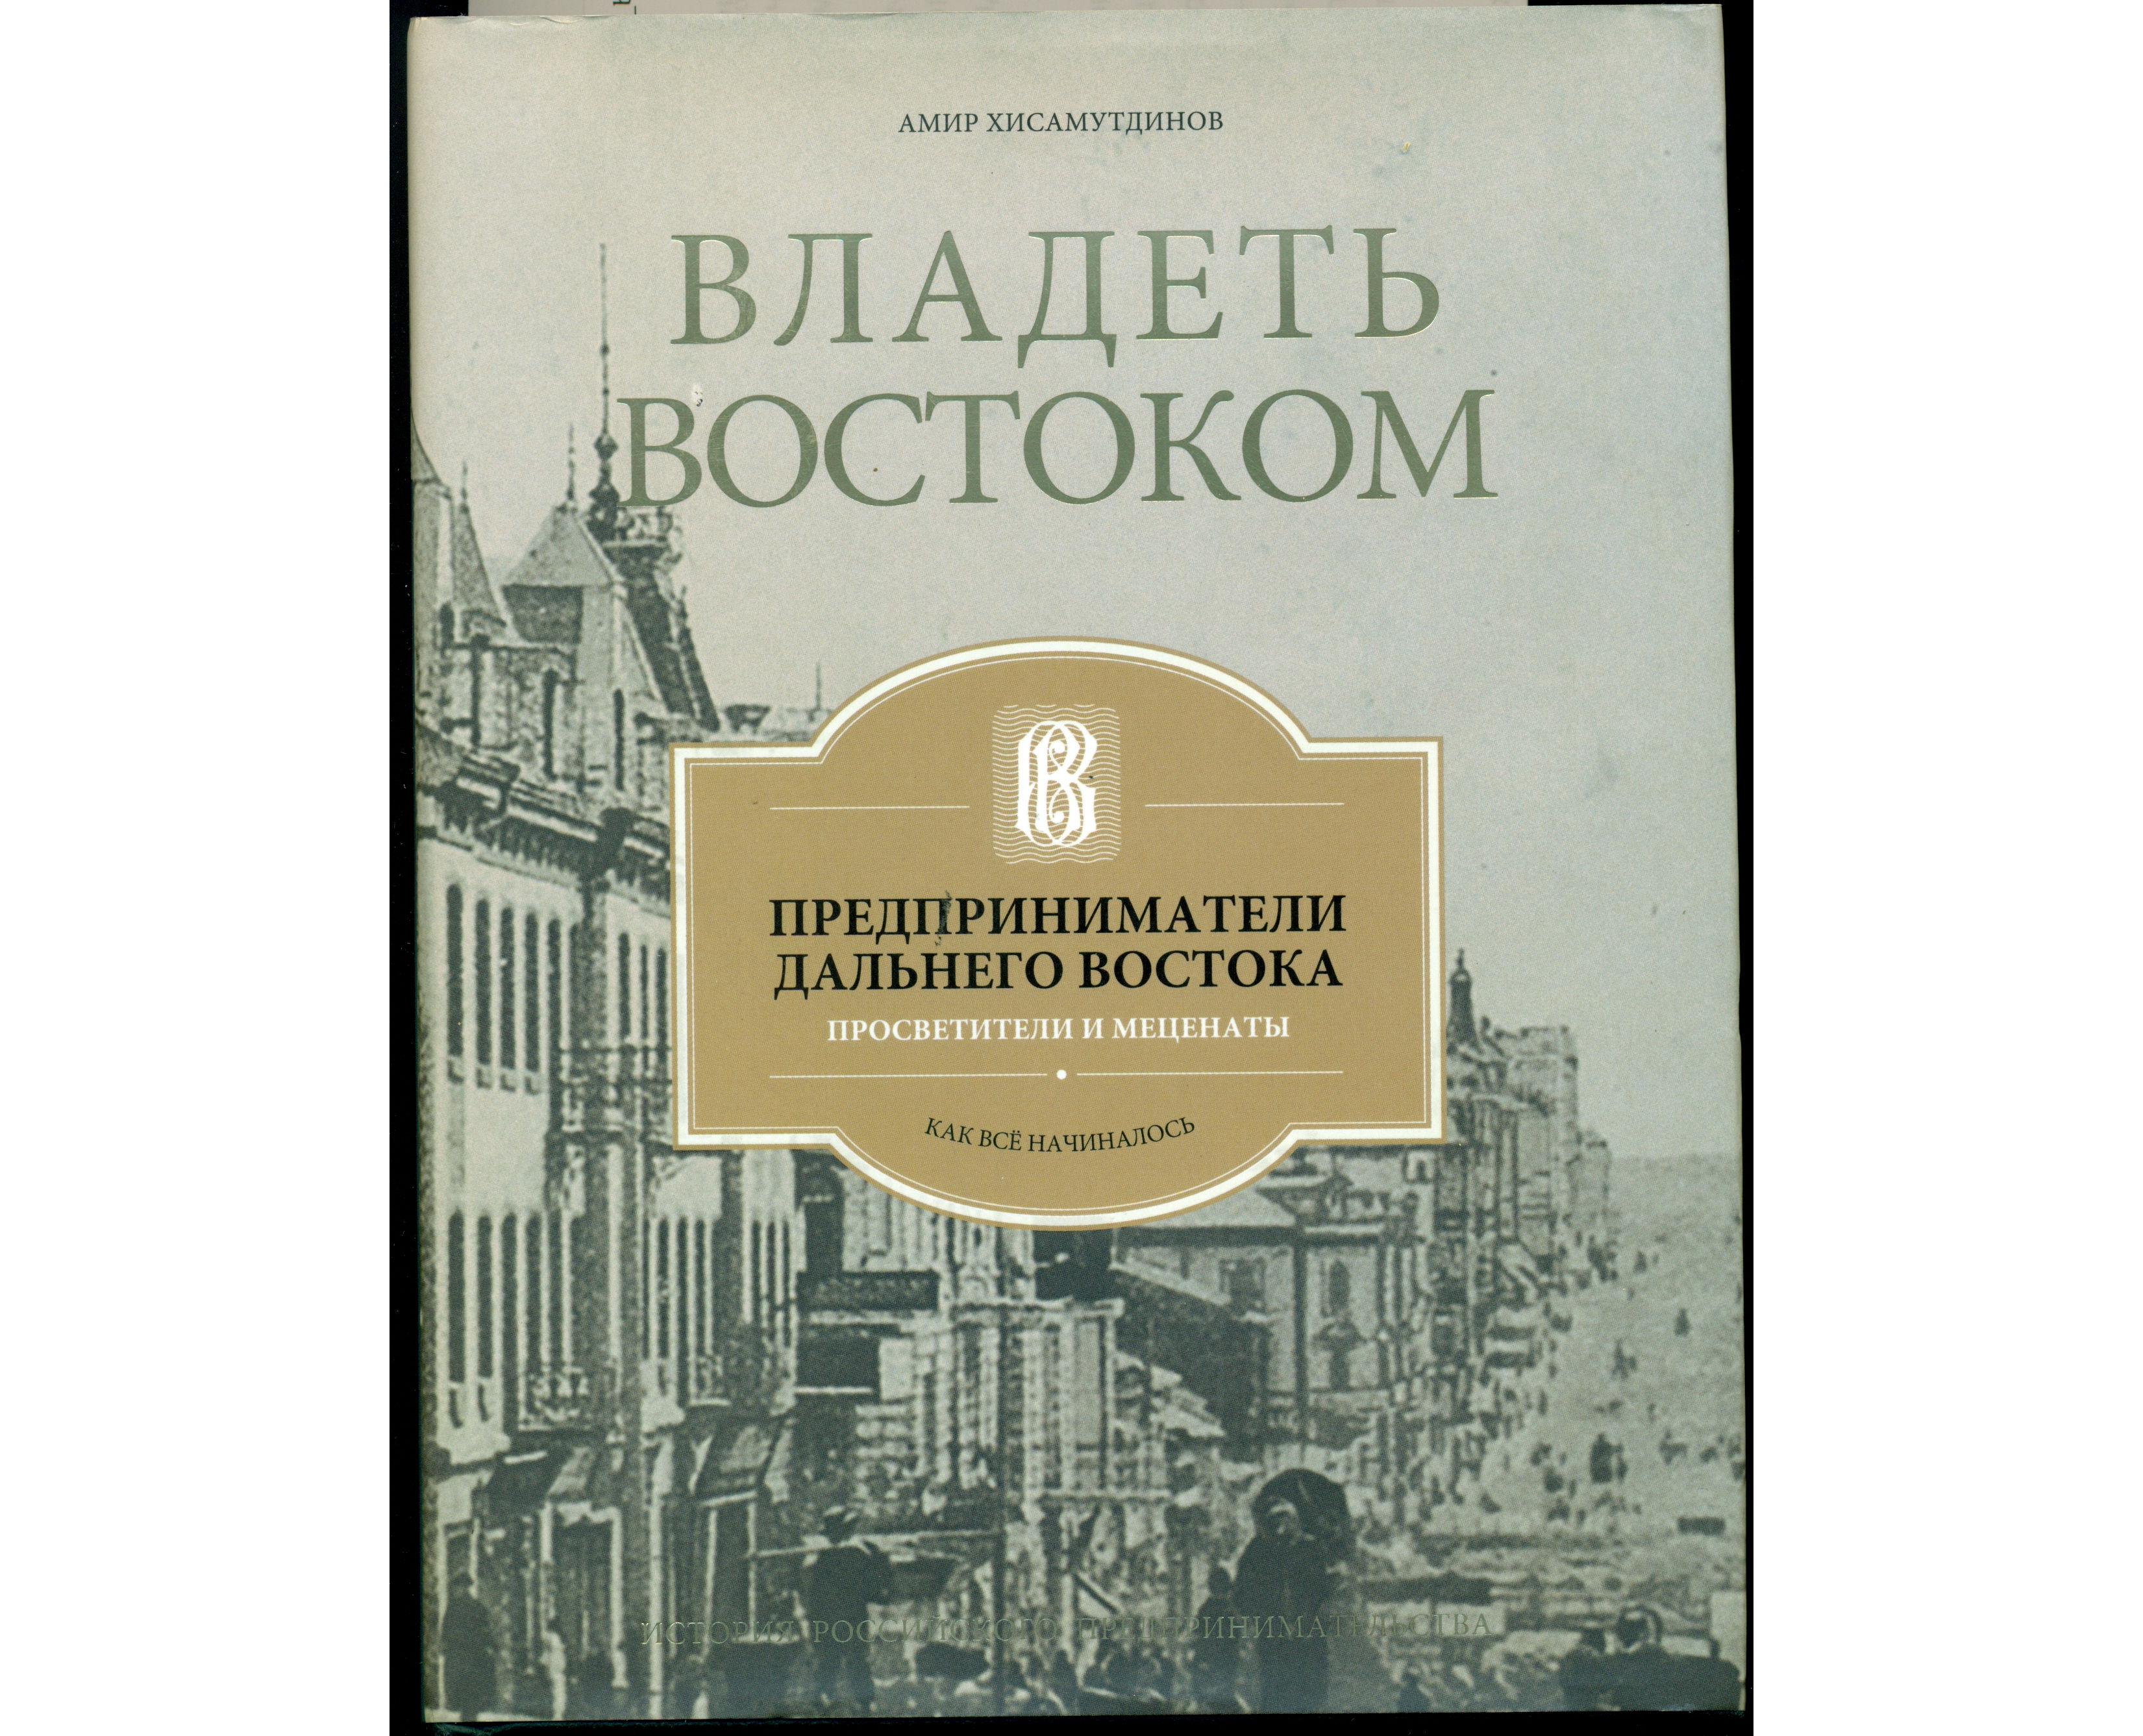 Book Cover of Vladet' Vostokom